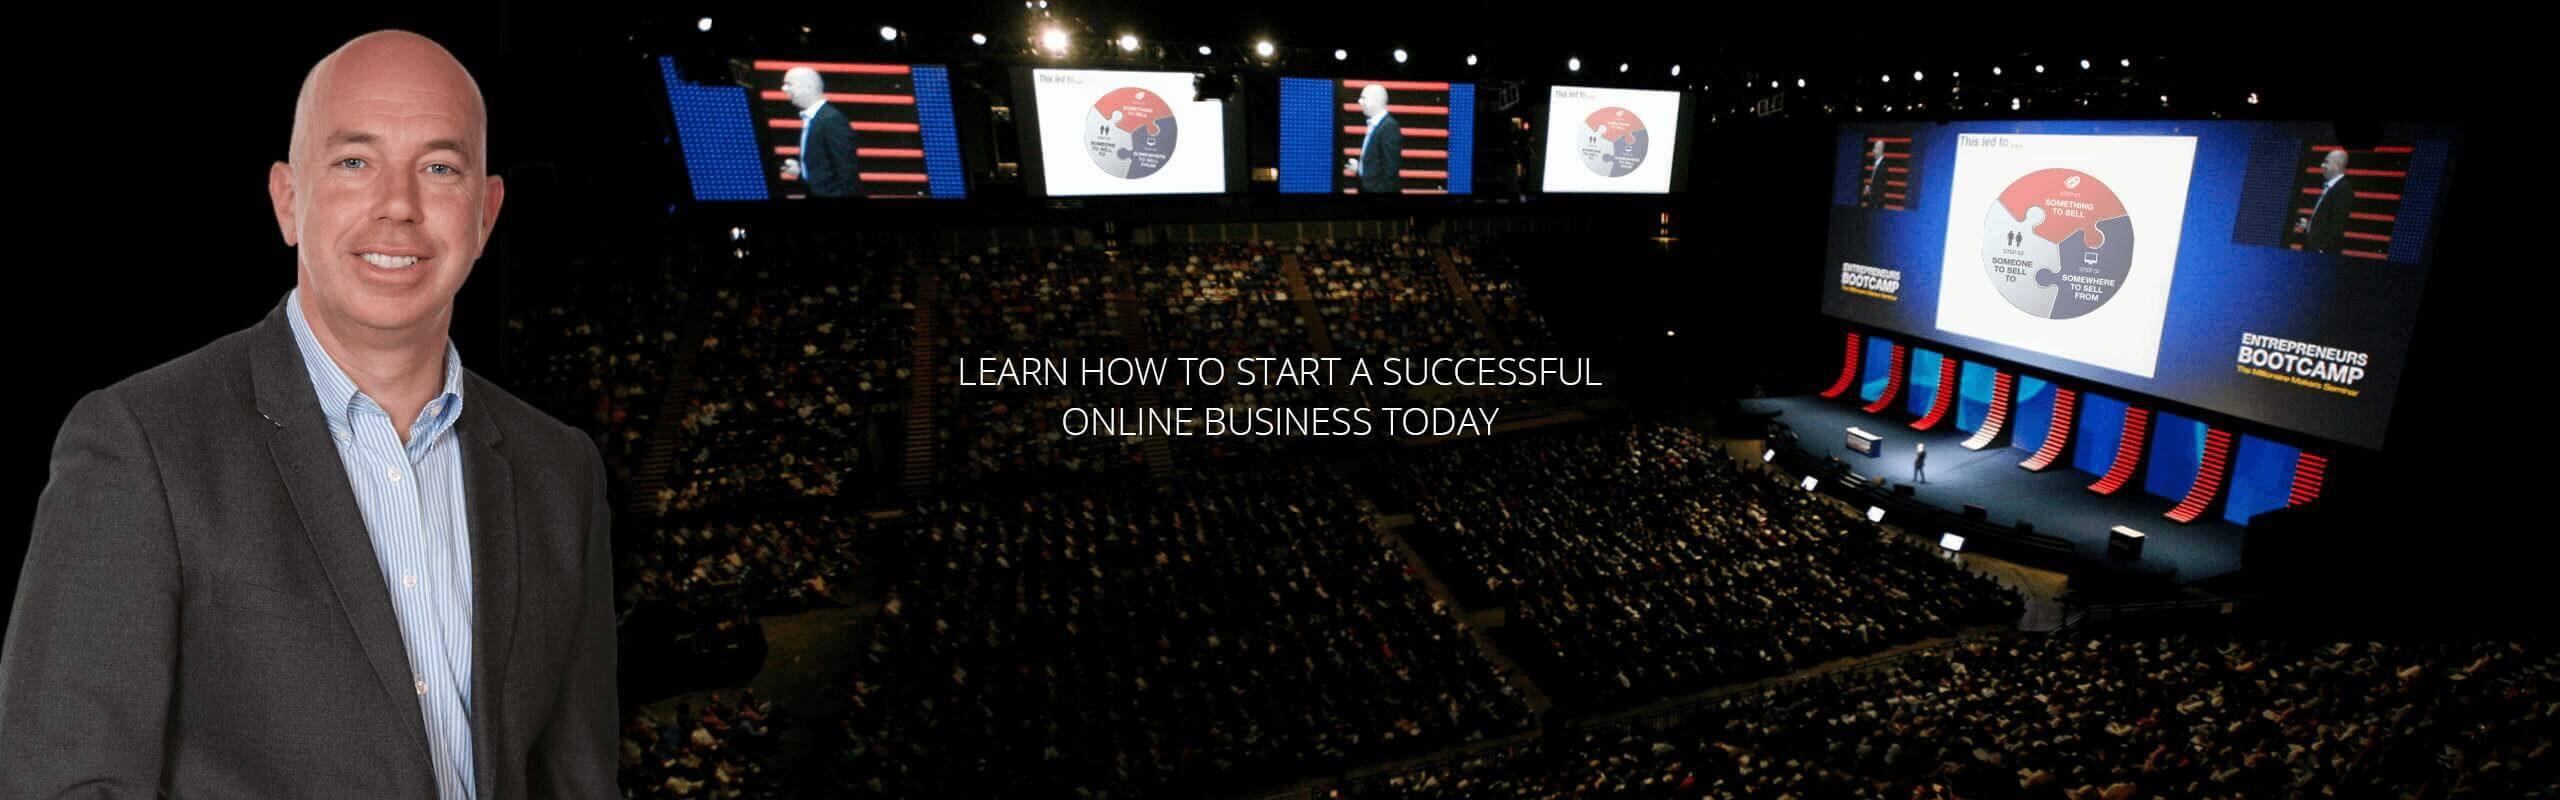 The Internet Business School - Header